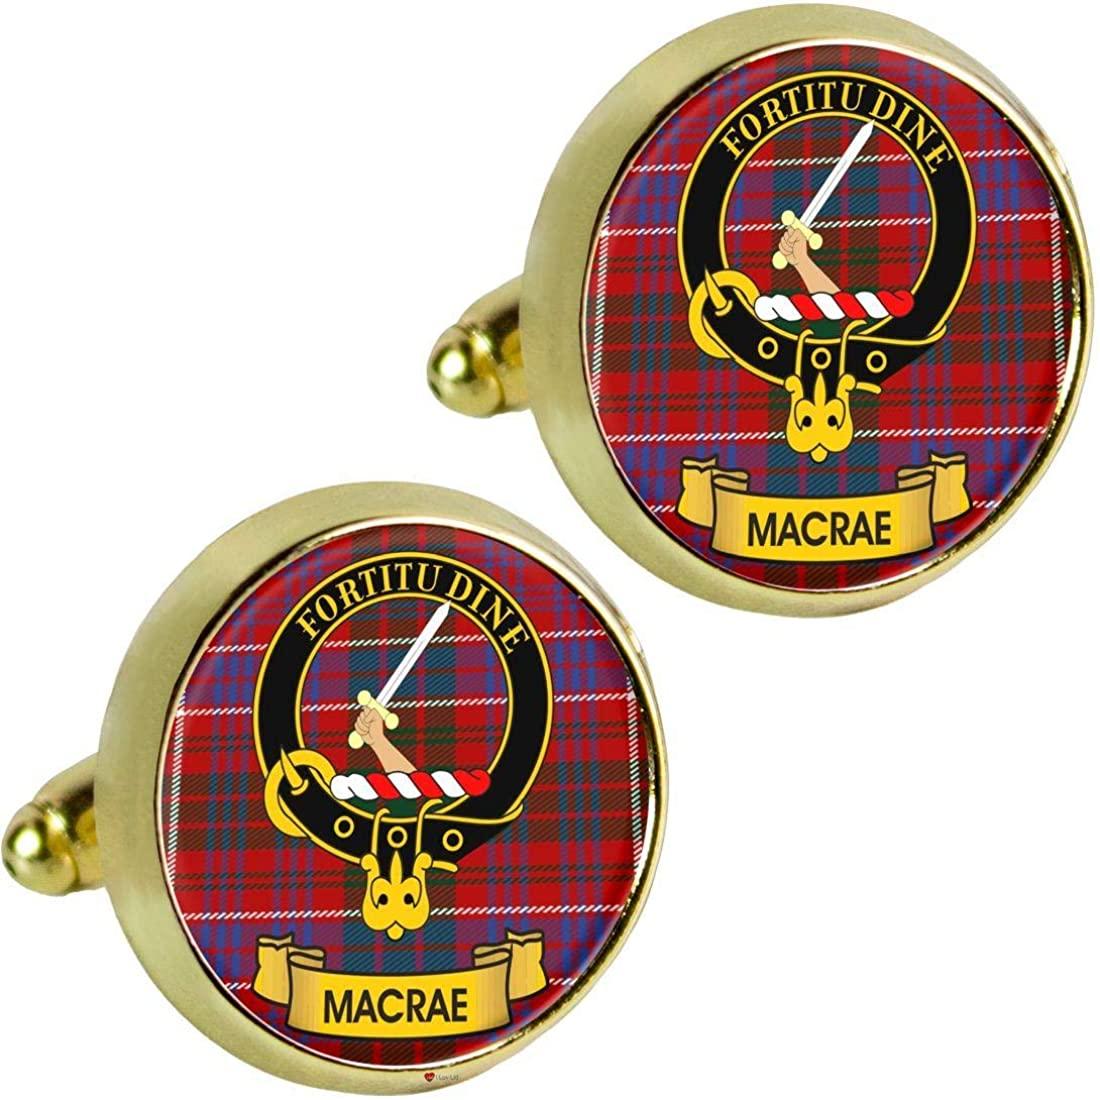 I LUV LTD Macrae Scottish Clan Crest Mens Cufflinks in Gold Colour Product of Scotland